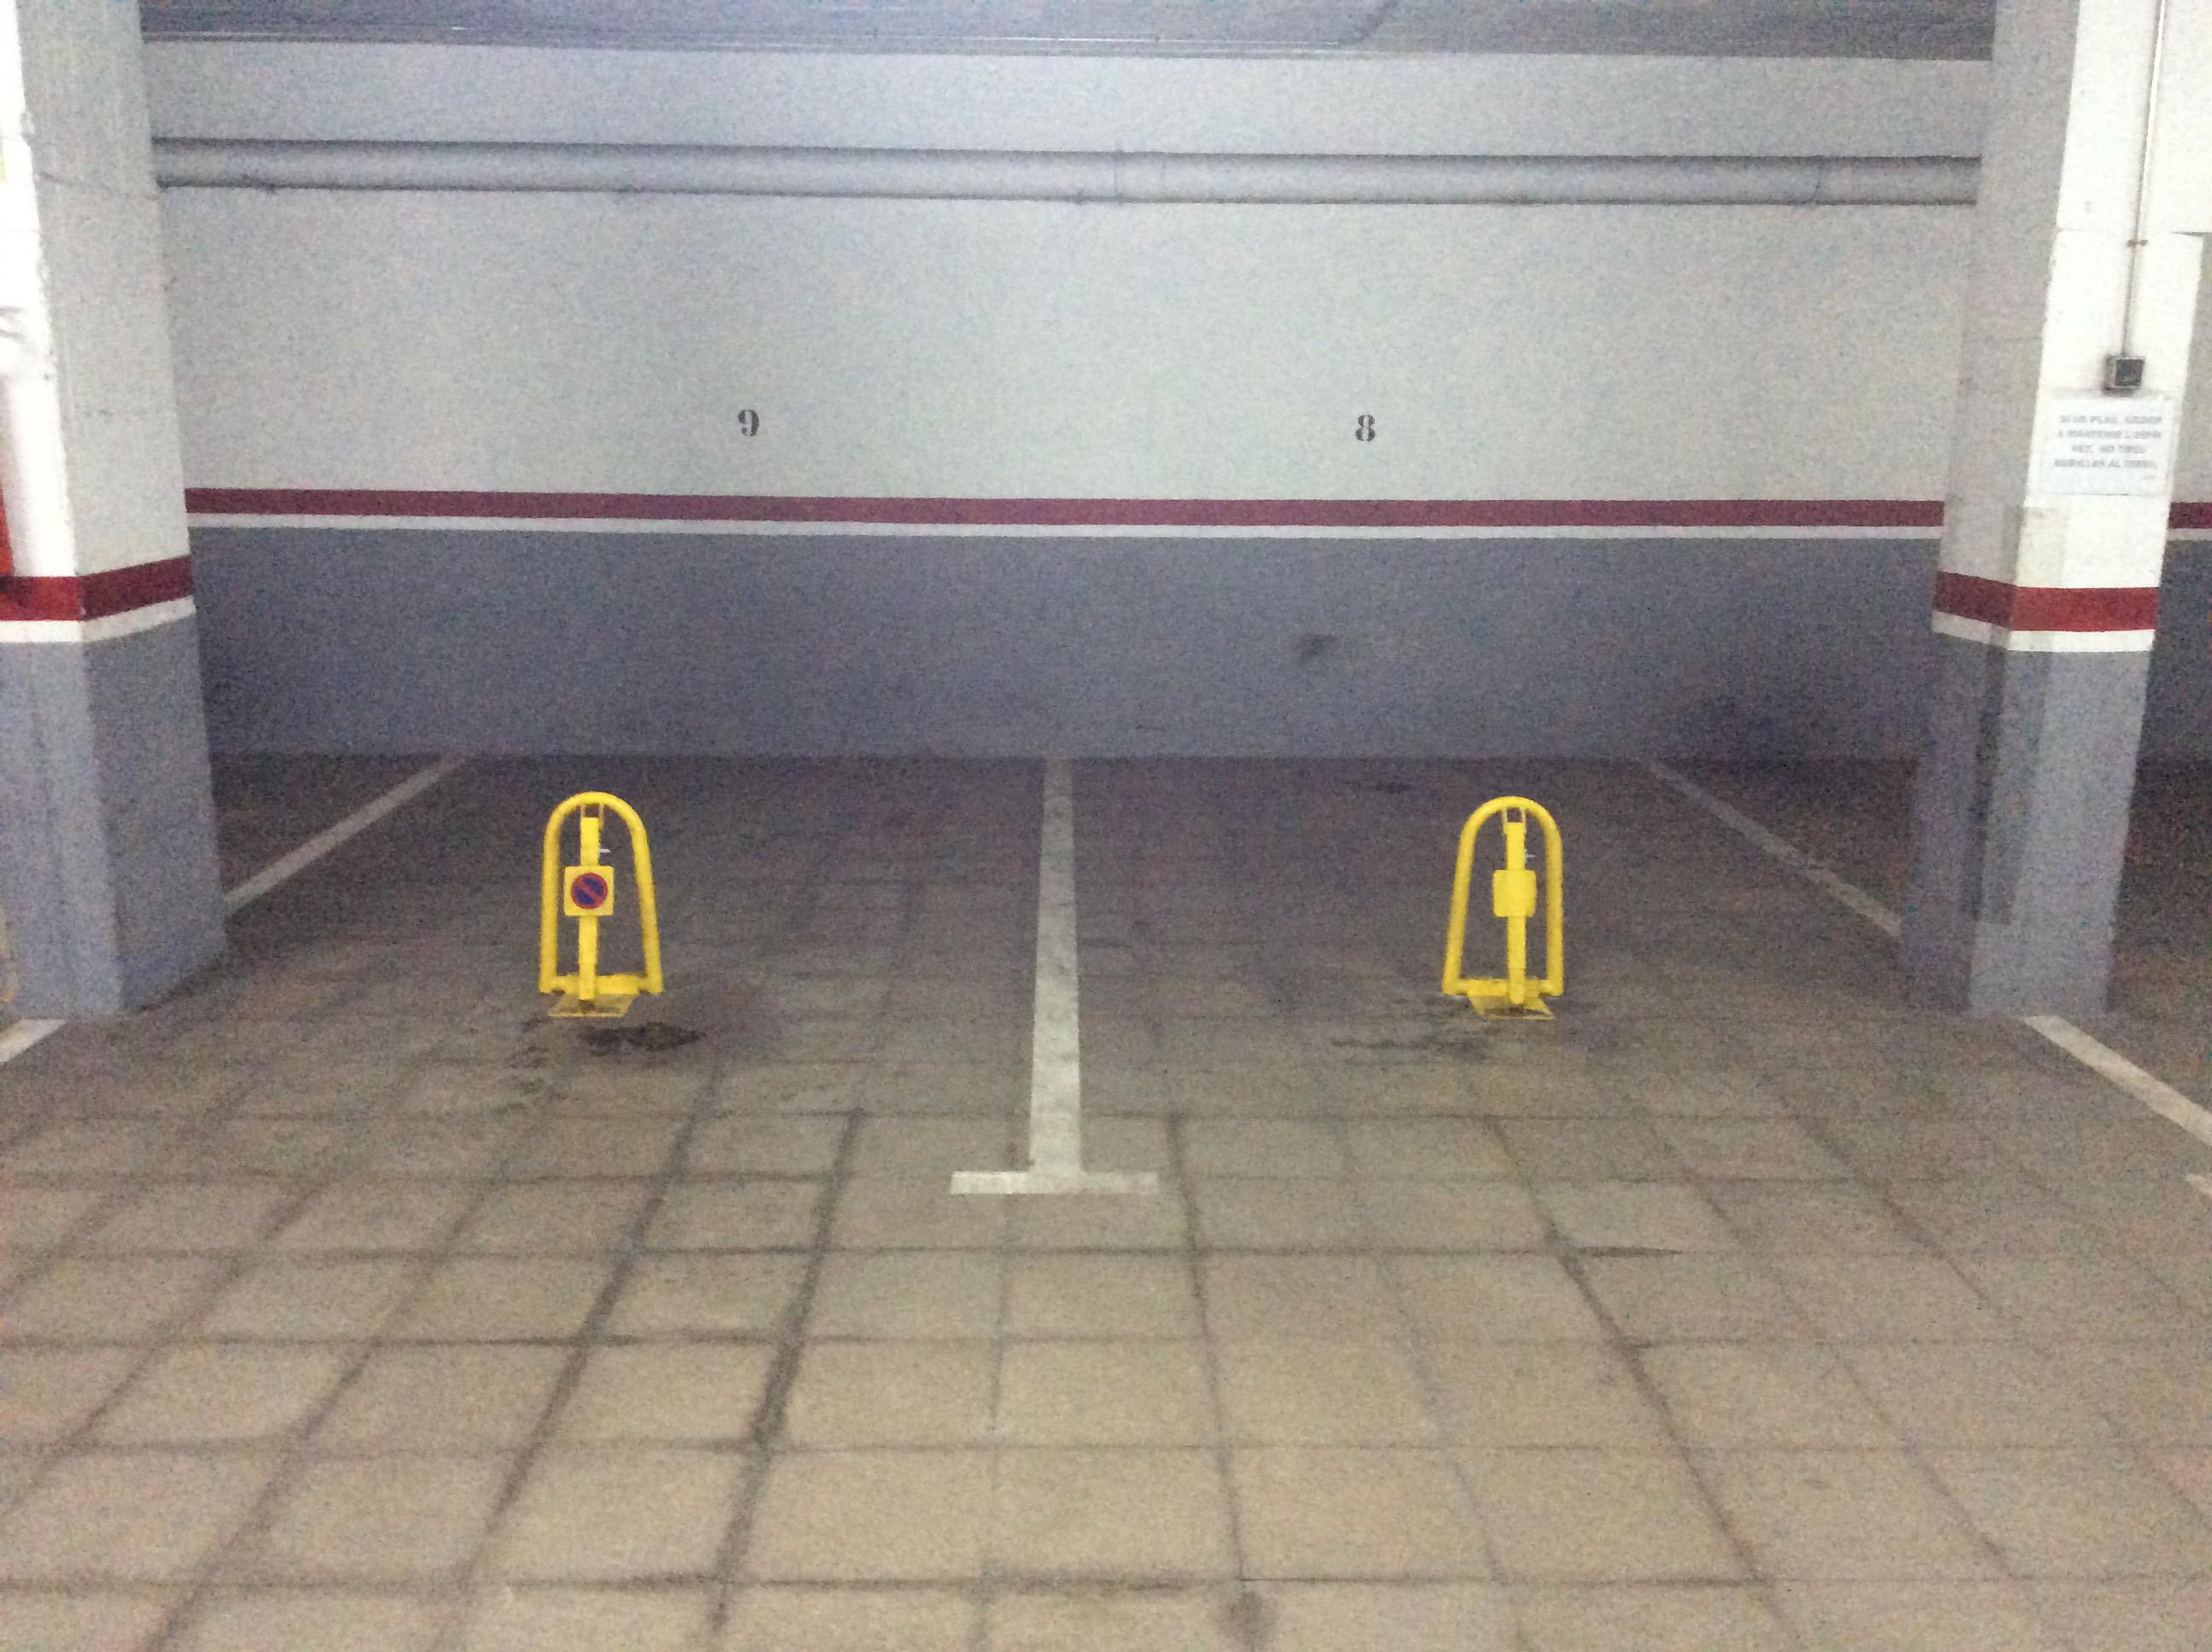 Imagen 1 Parking Coche en venta en Mollet Del Vallès / Gaietà Vinzia entre via de Ronda y Avda. jaume I